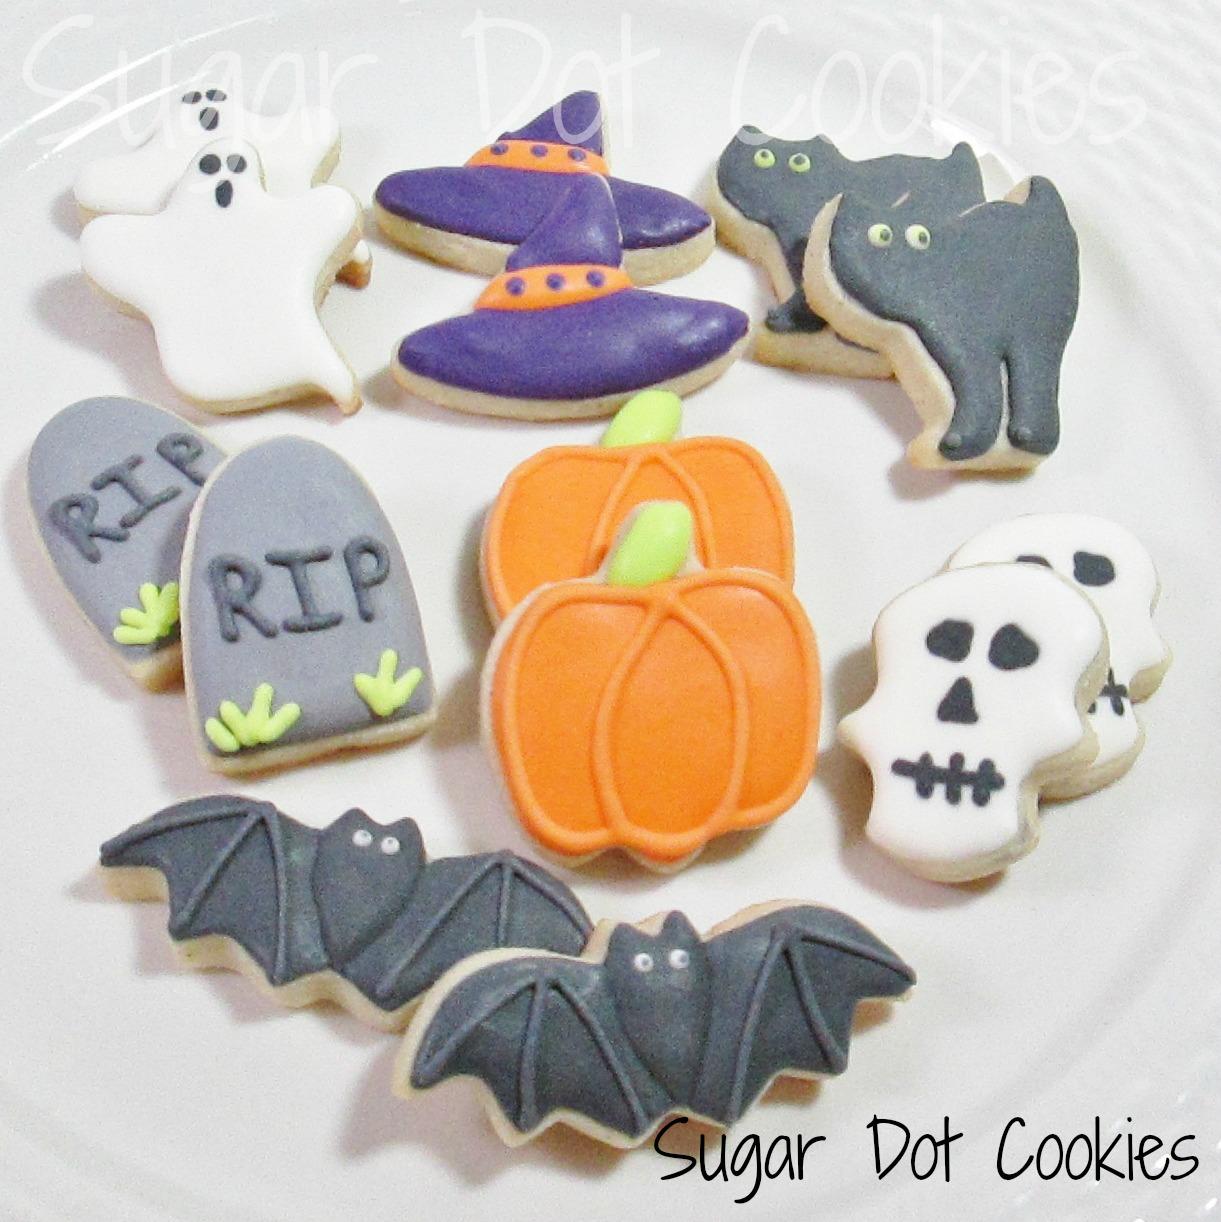 Sugar Dot Cookies: Halloween Sugar Cookies with Royal Icing